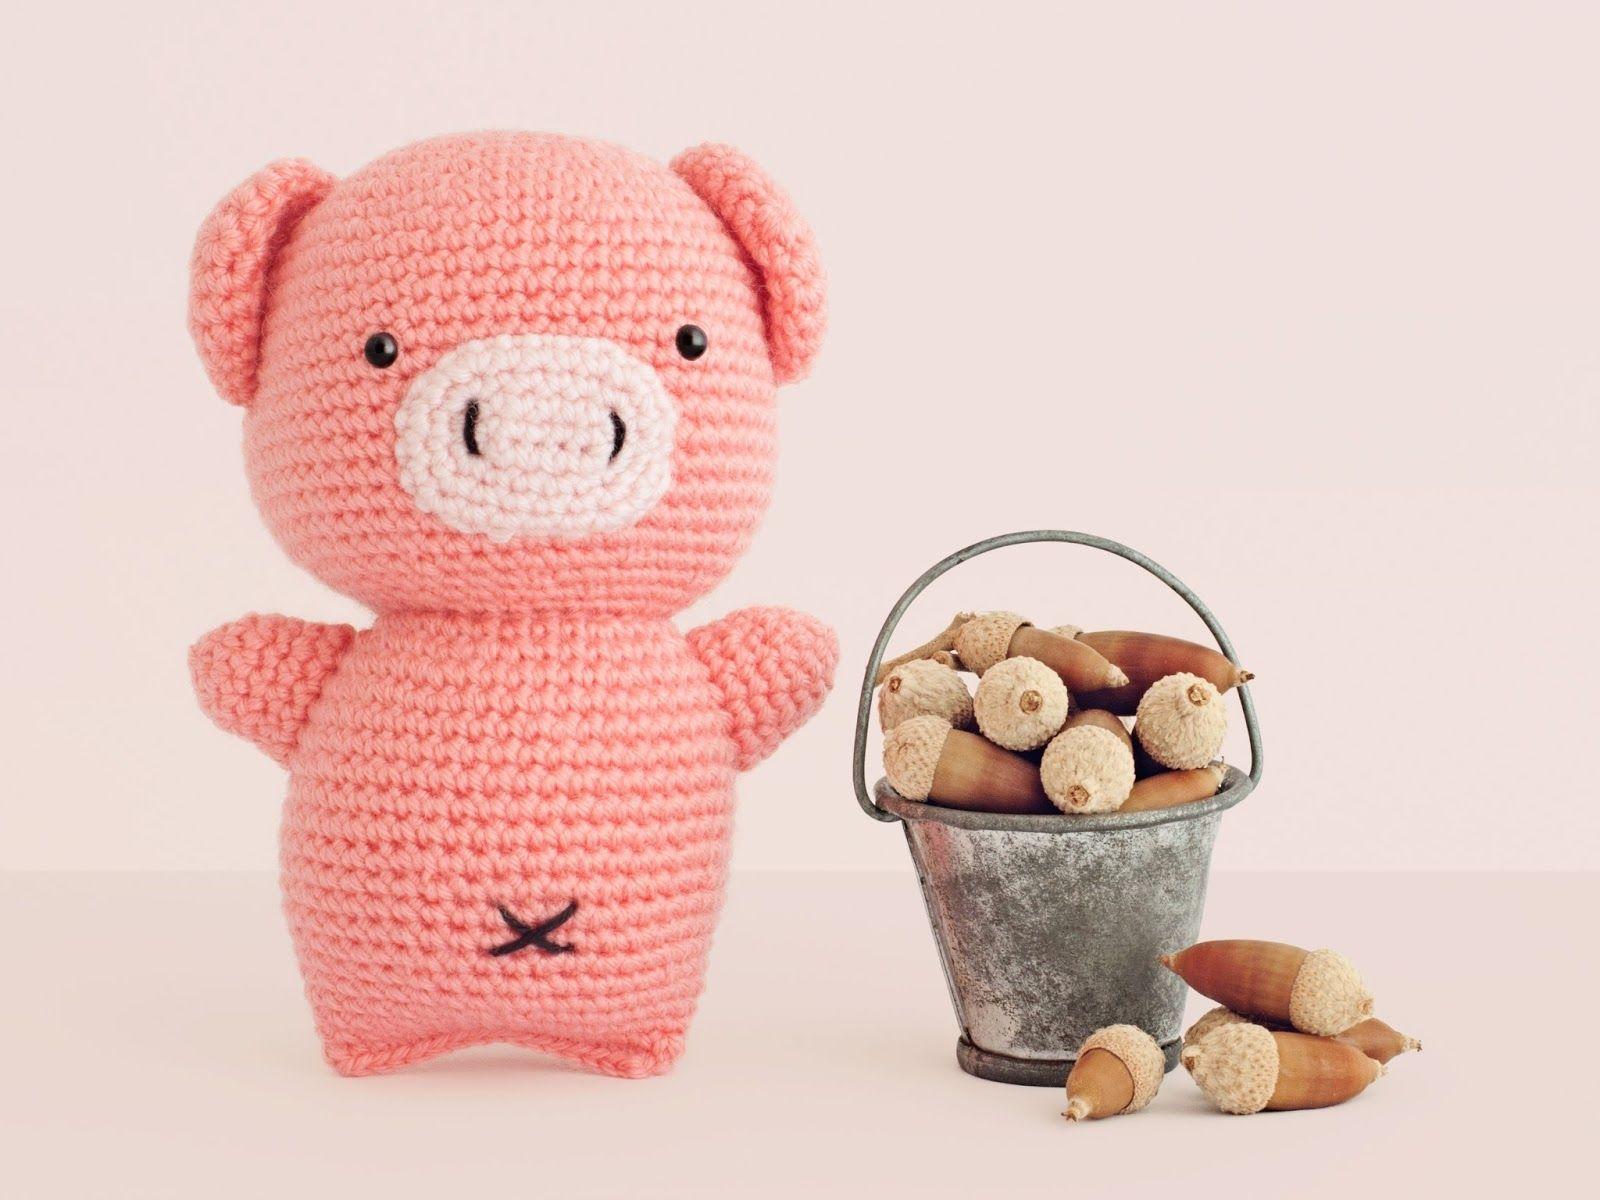 Amigurumi Pig - FREE Crochet Pattern / Tutorial | игрушки ...